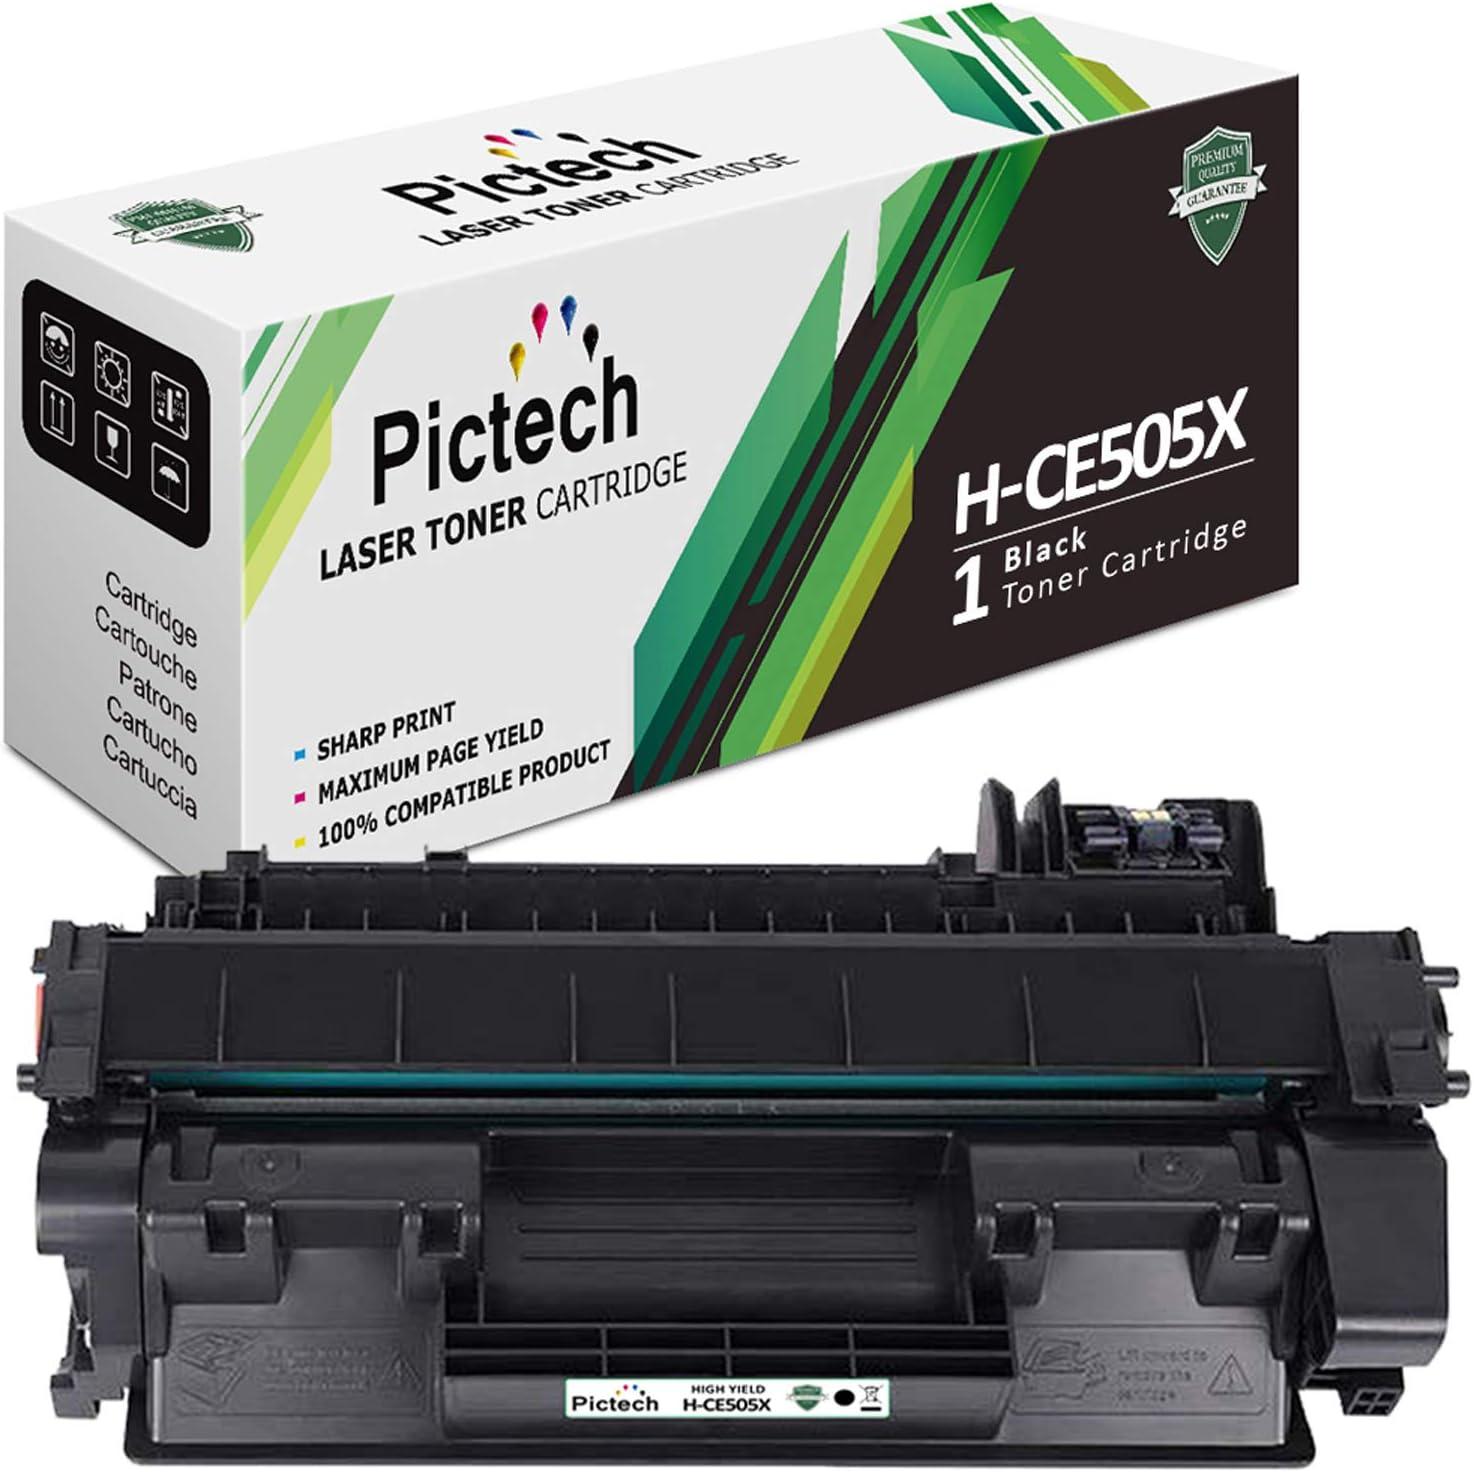 Chip for HP Laserjet P 2053 2054 2055 2056 2057 D X DN DTN Fills CE505X 05X Eurotone XXL Refill Toner